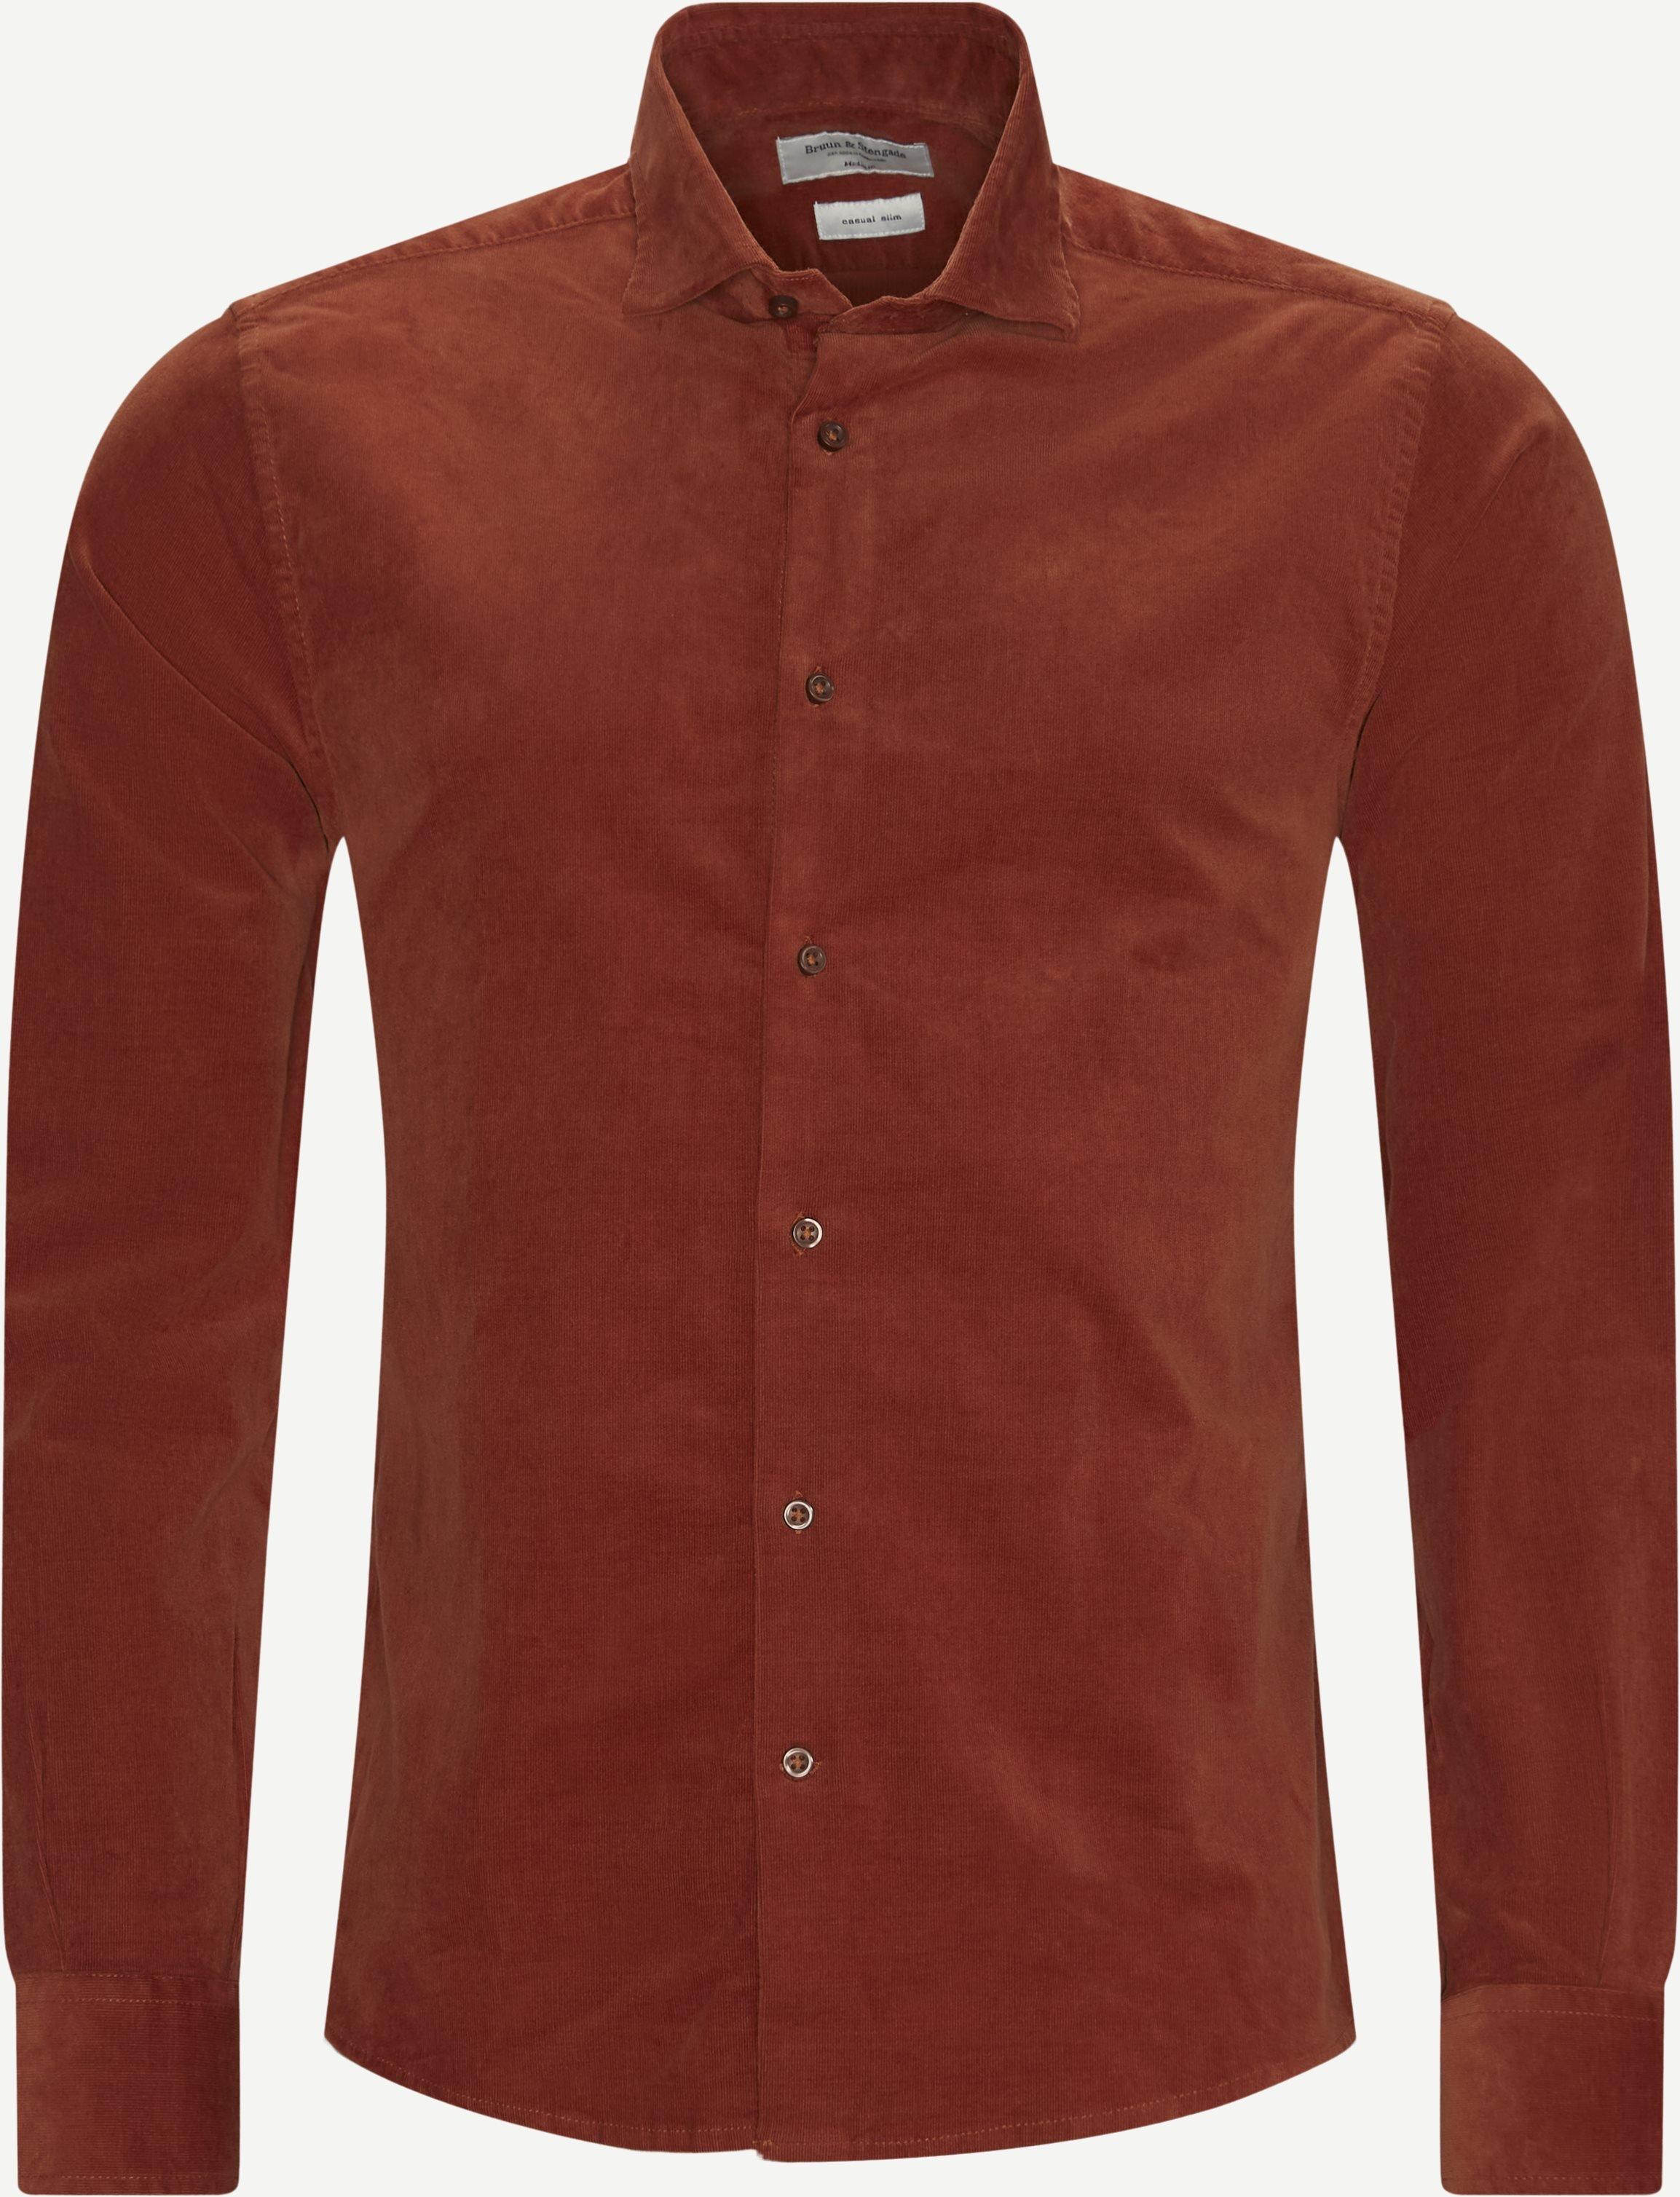 Kyoto Shirt - Skjortor - Regular slim fit - Orange